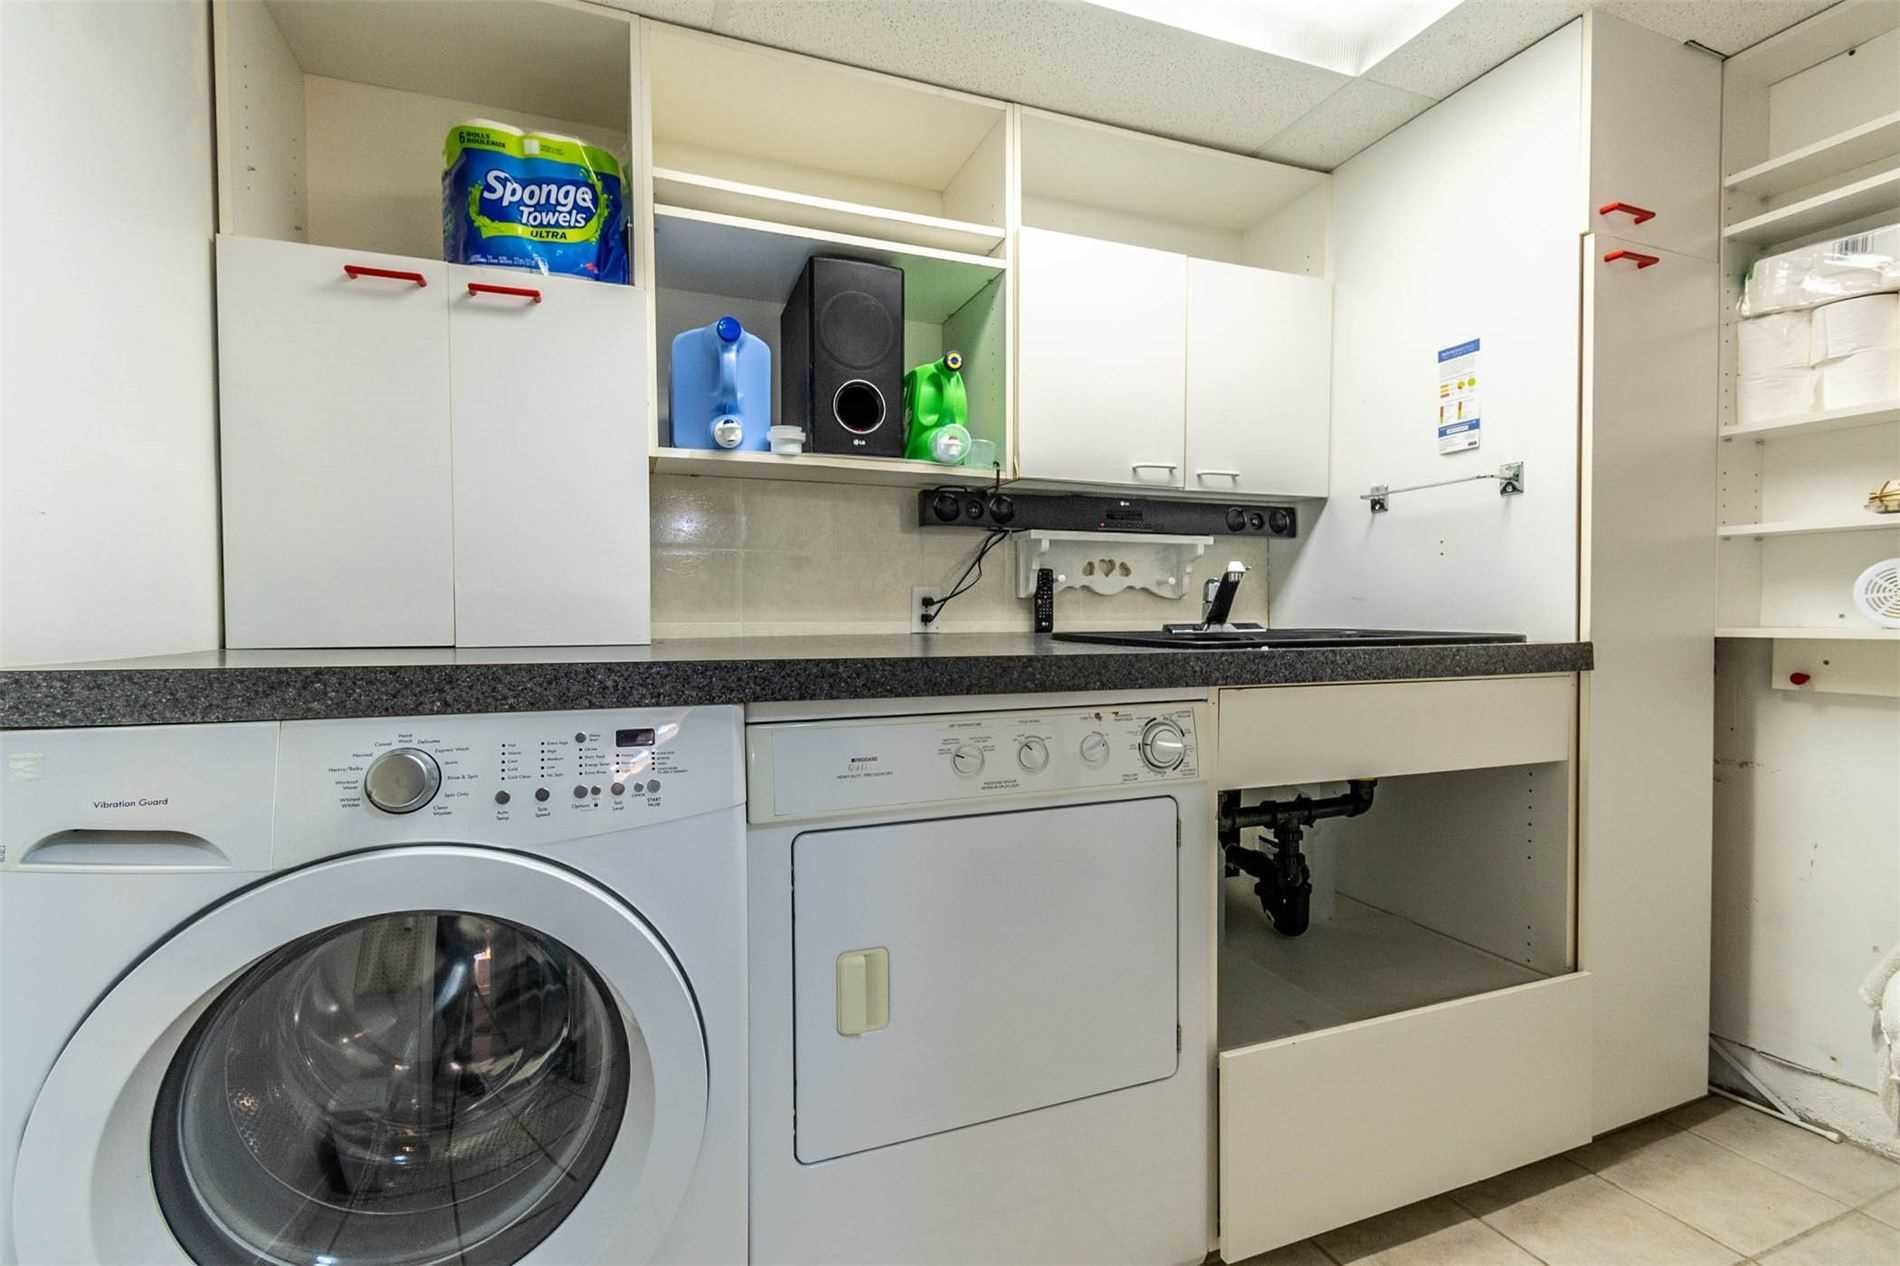 206 Commercial St, Welland, Ontario L3B5Z6, 2 Bedrooms Bedrooms, ,2 BathroomsBathrooms,Semi-detached,For Sale,Commercial,X5369435